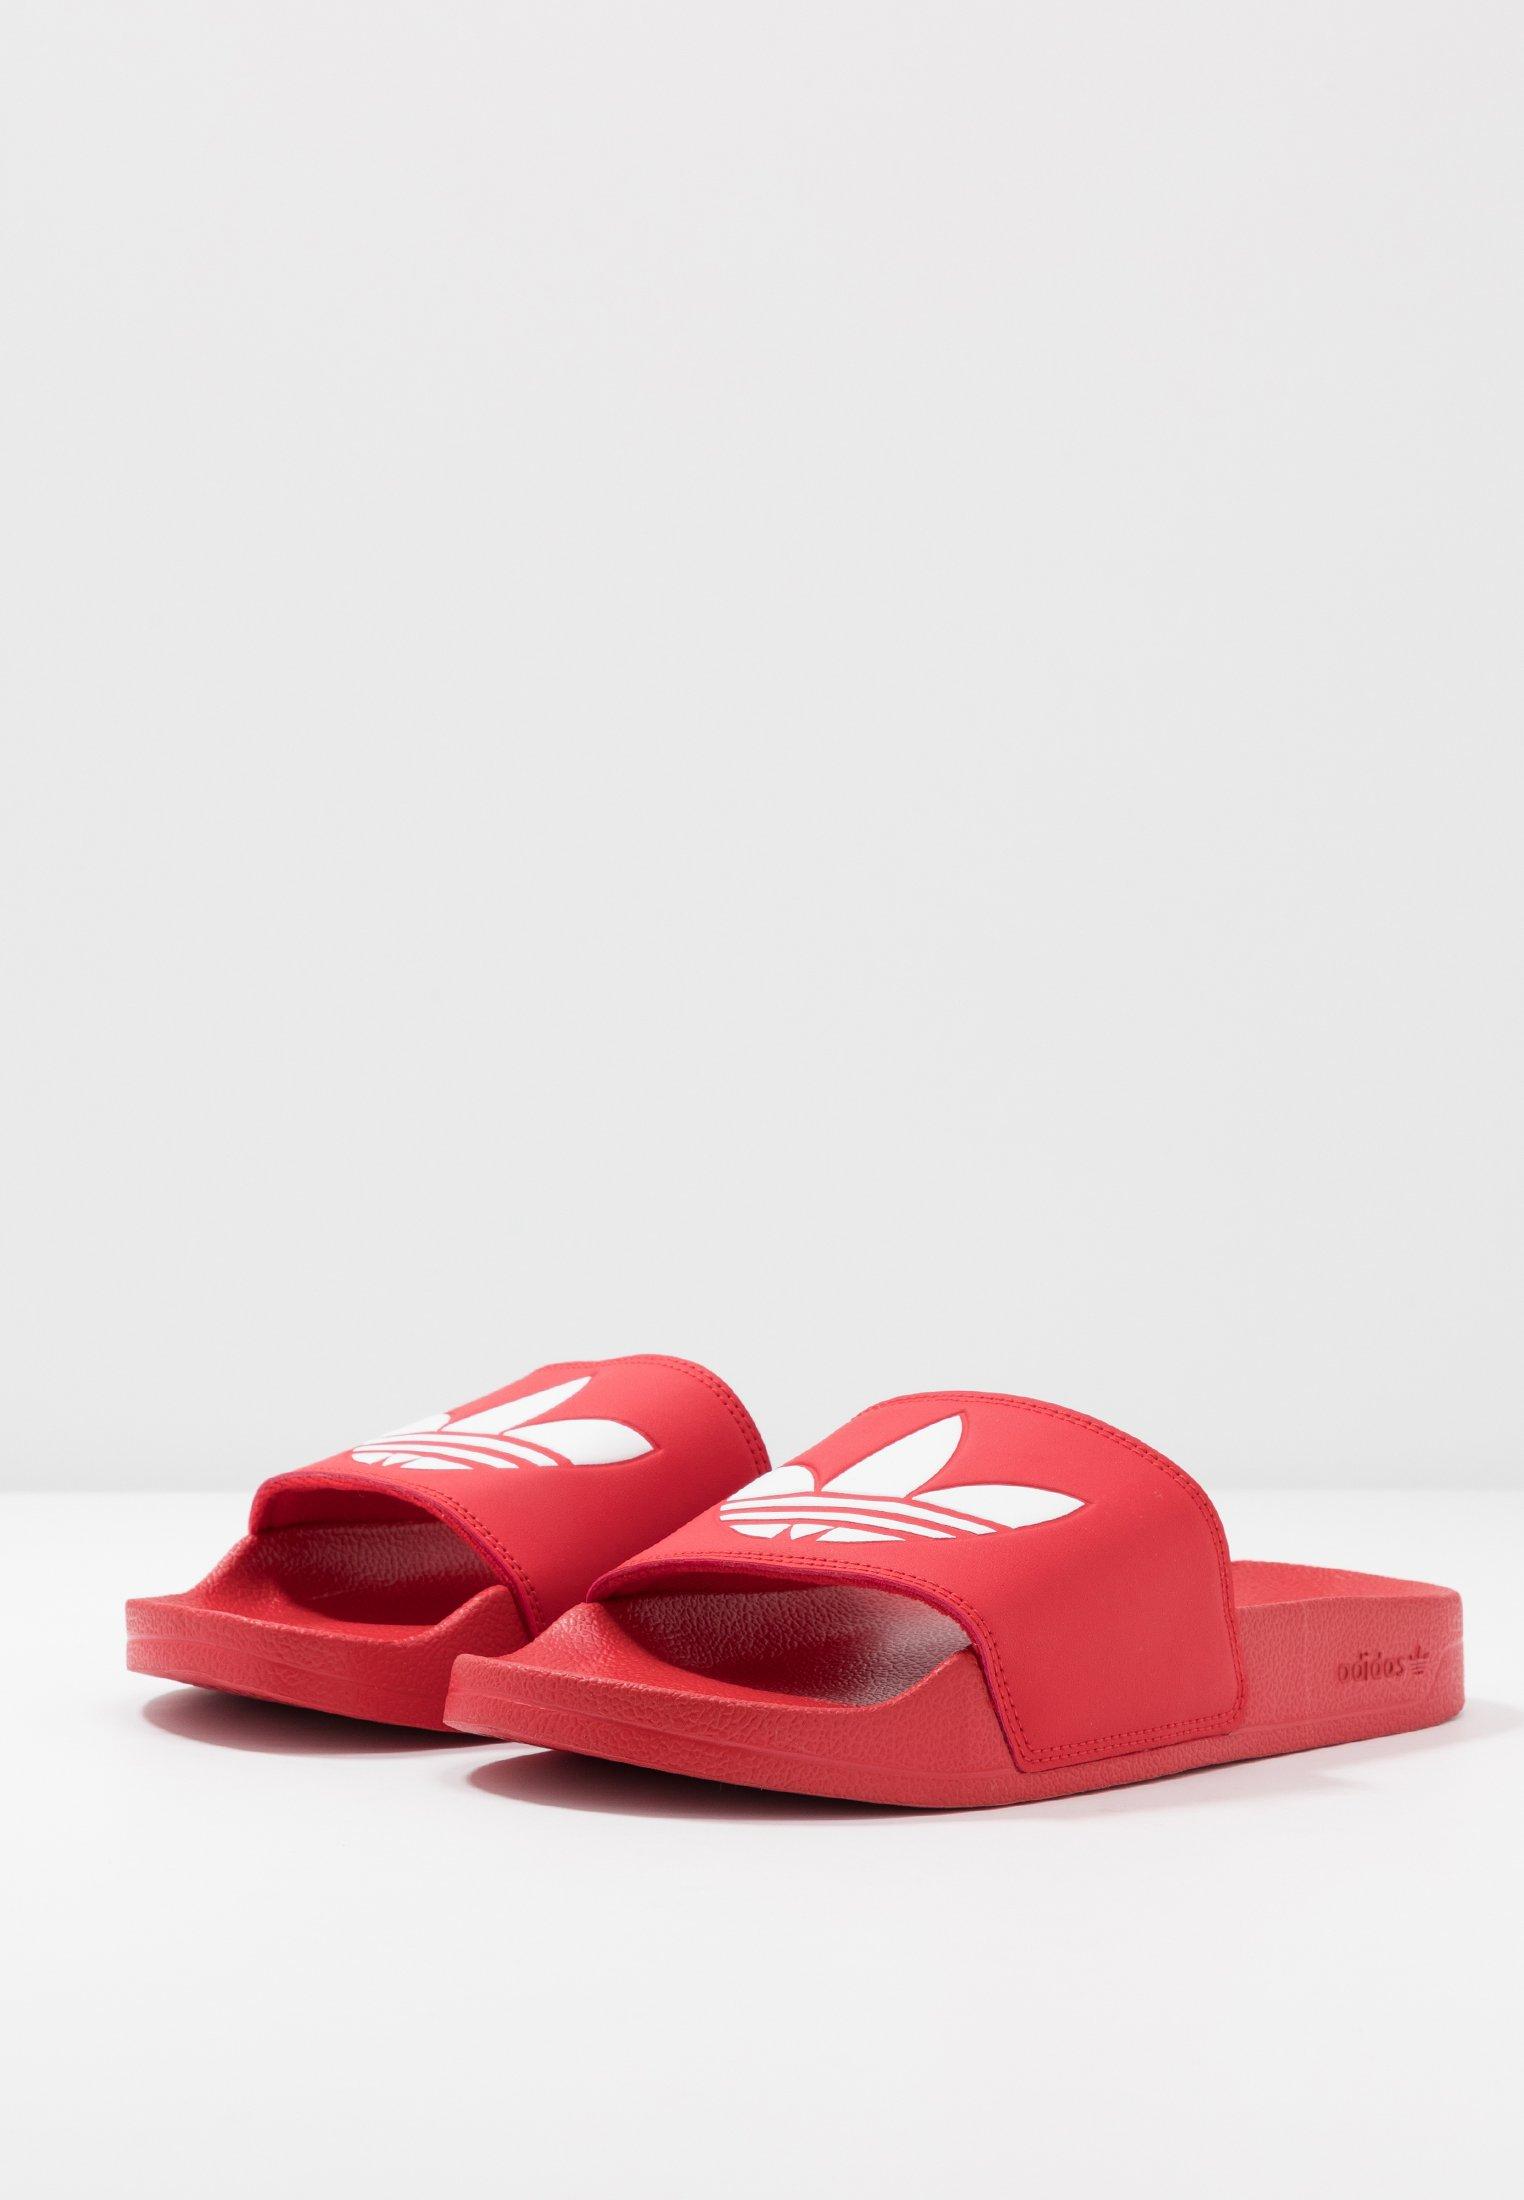 Adidas Originals Adilette Lite - Sandalias Planas Scarle/ftwwht/scarle